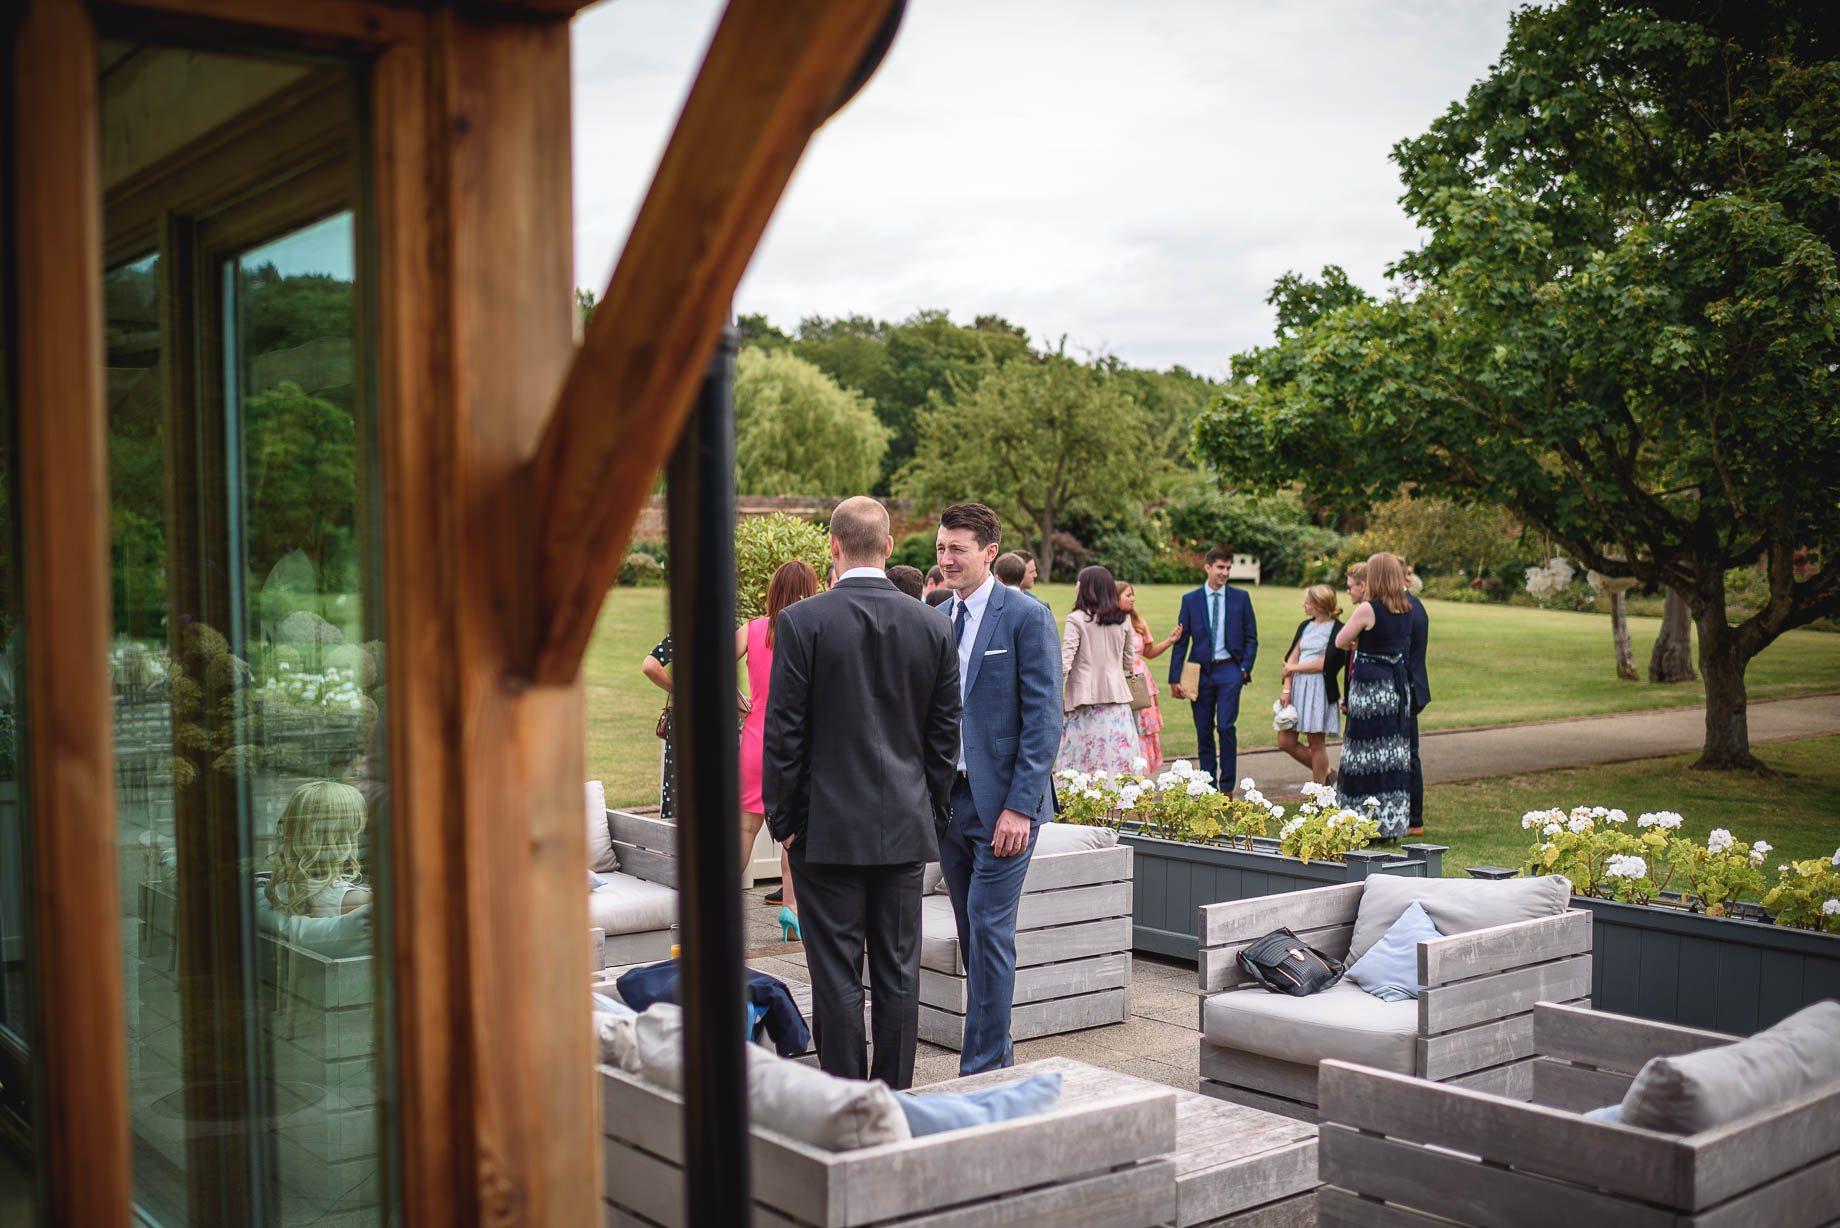 Gaynes Park wedding photography - Guy Collier Photography - Rachel and Jon (46 of 169)